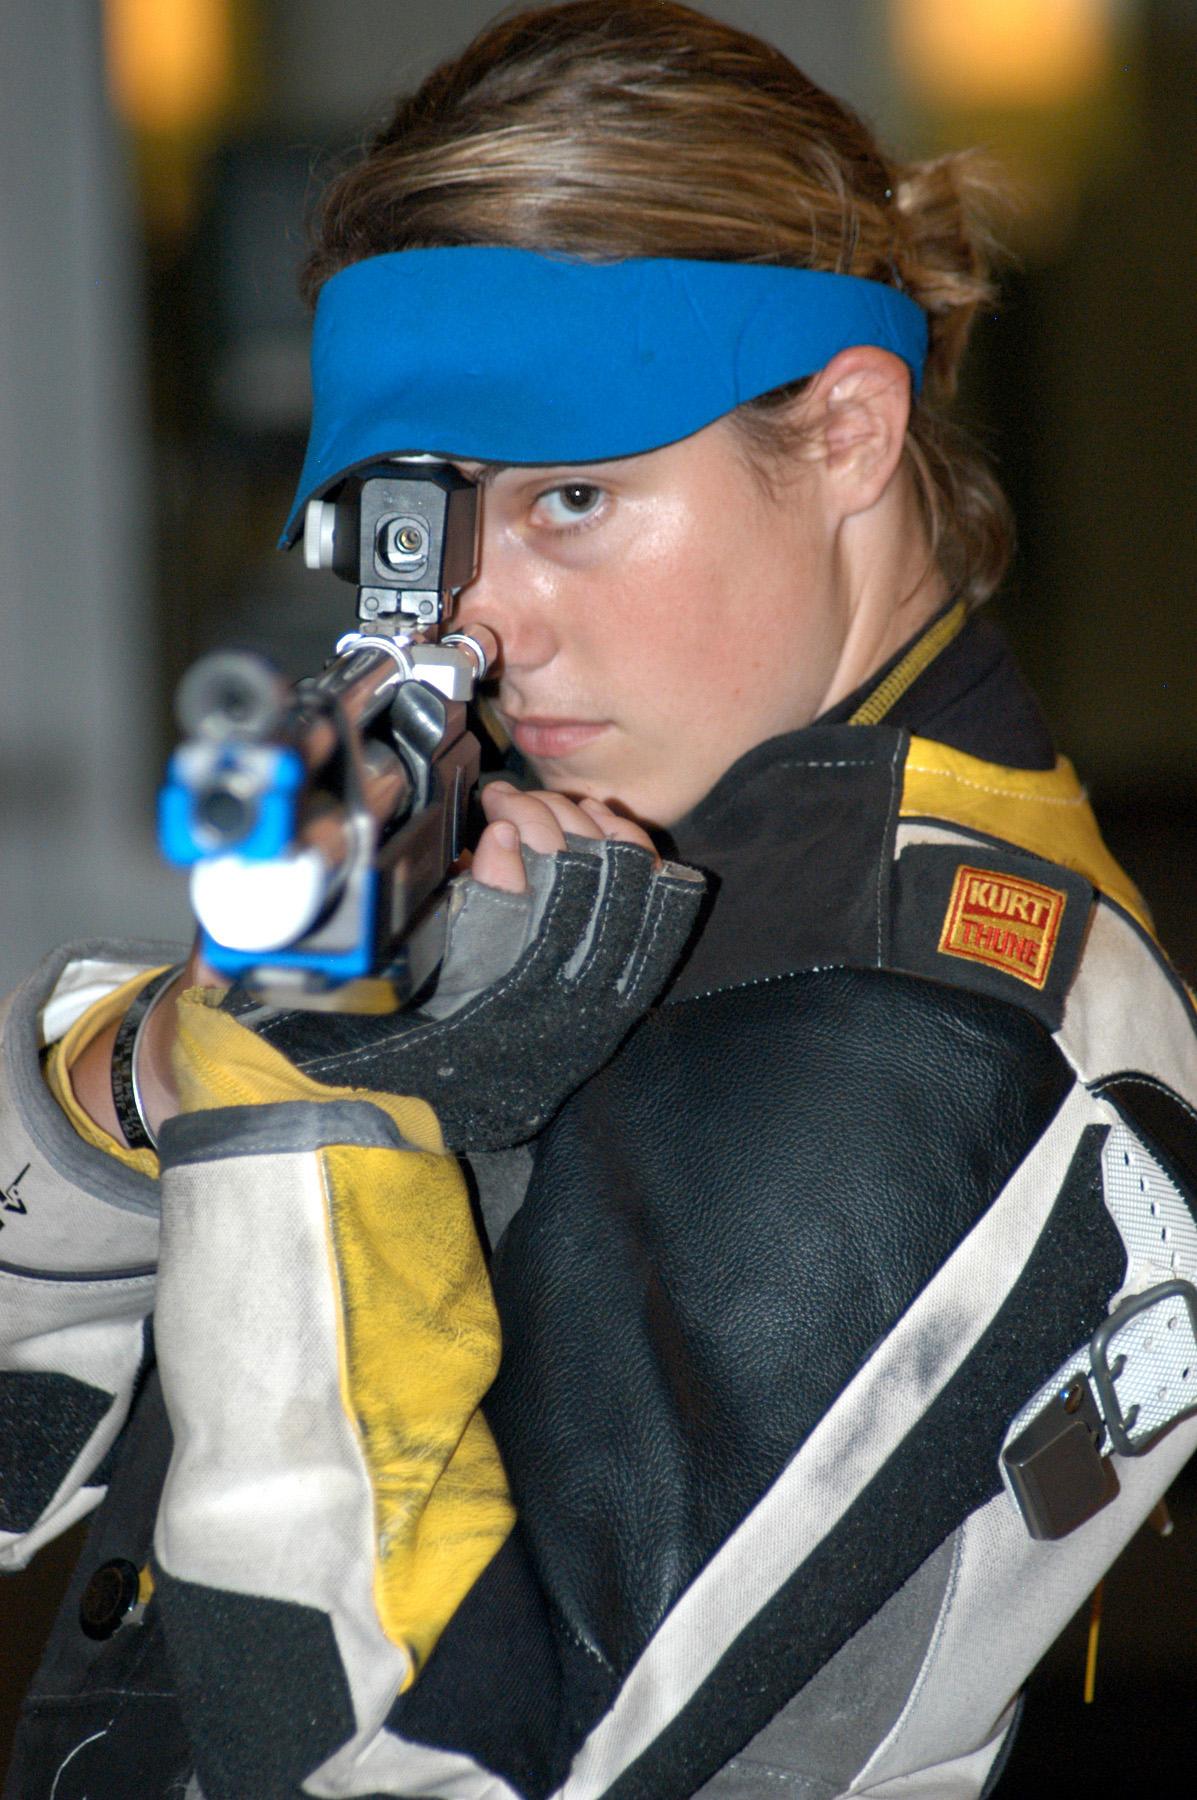 Shooting sport - Wikipedia